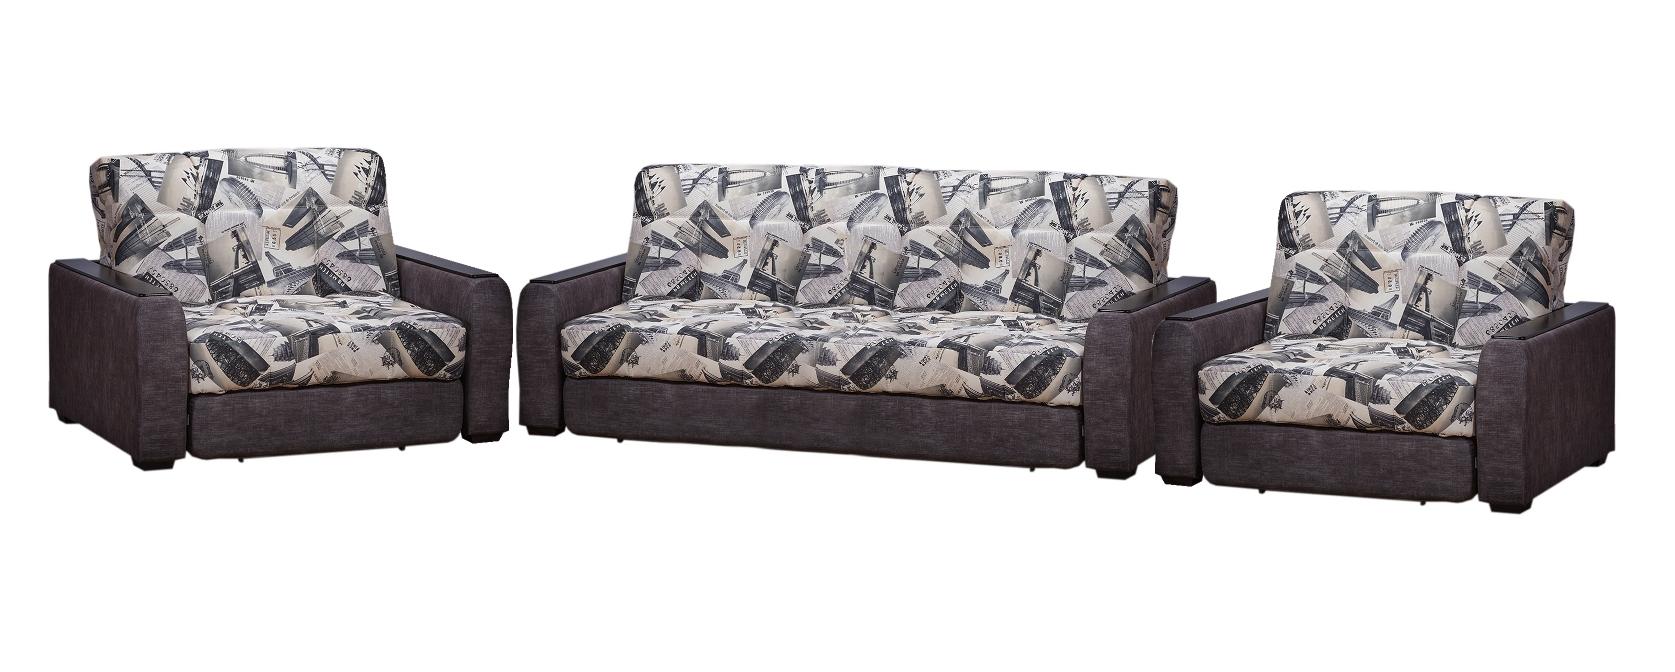 Комплект мягкой мебели Гадар